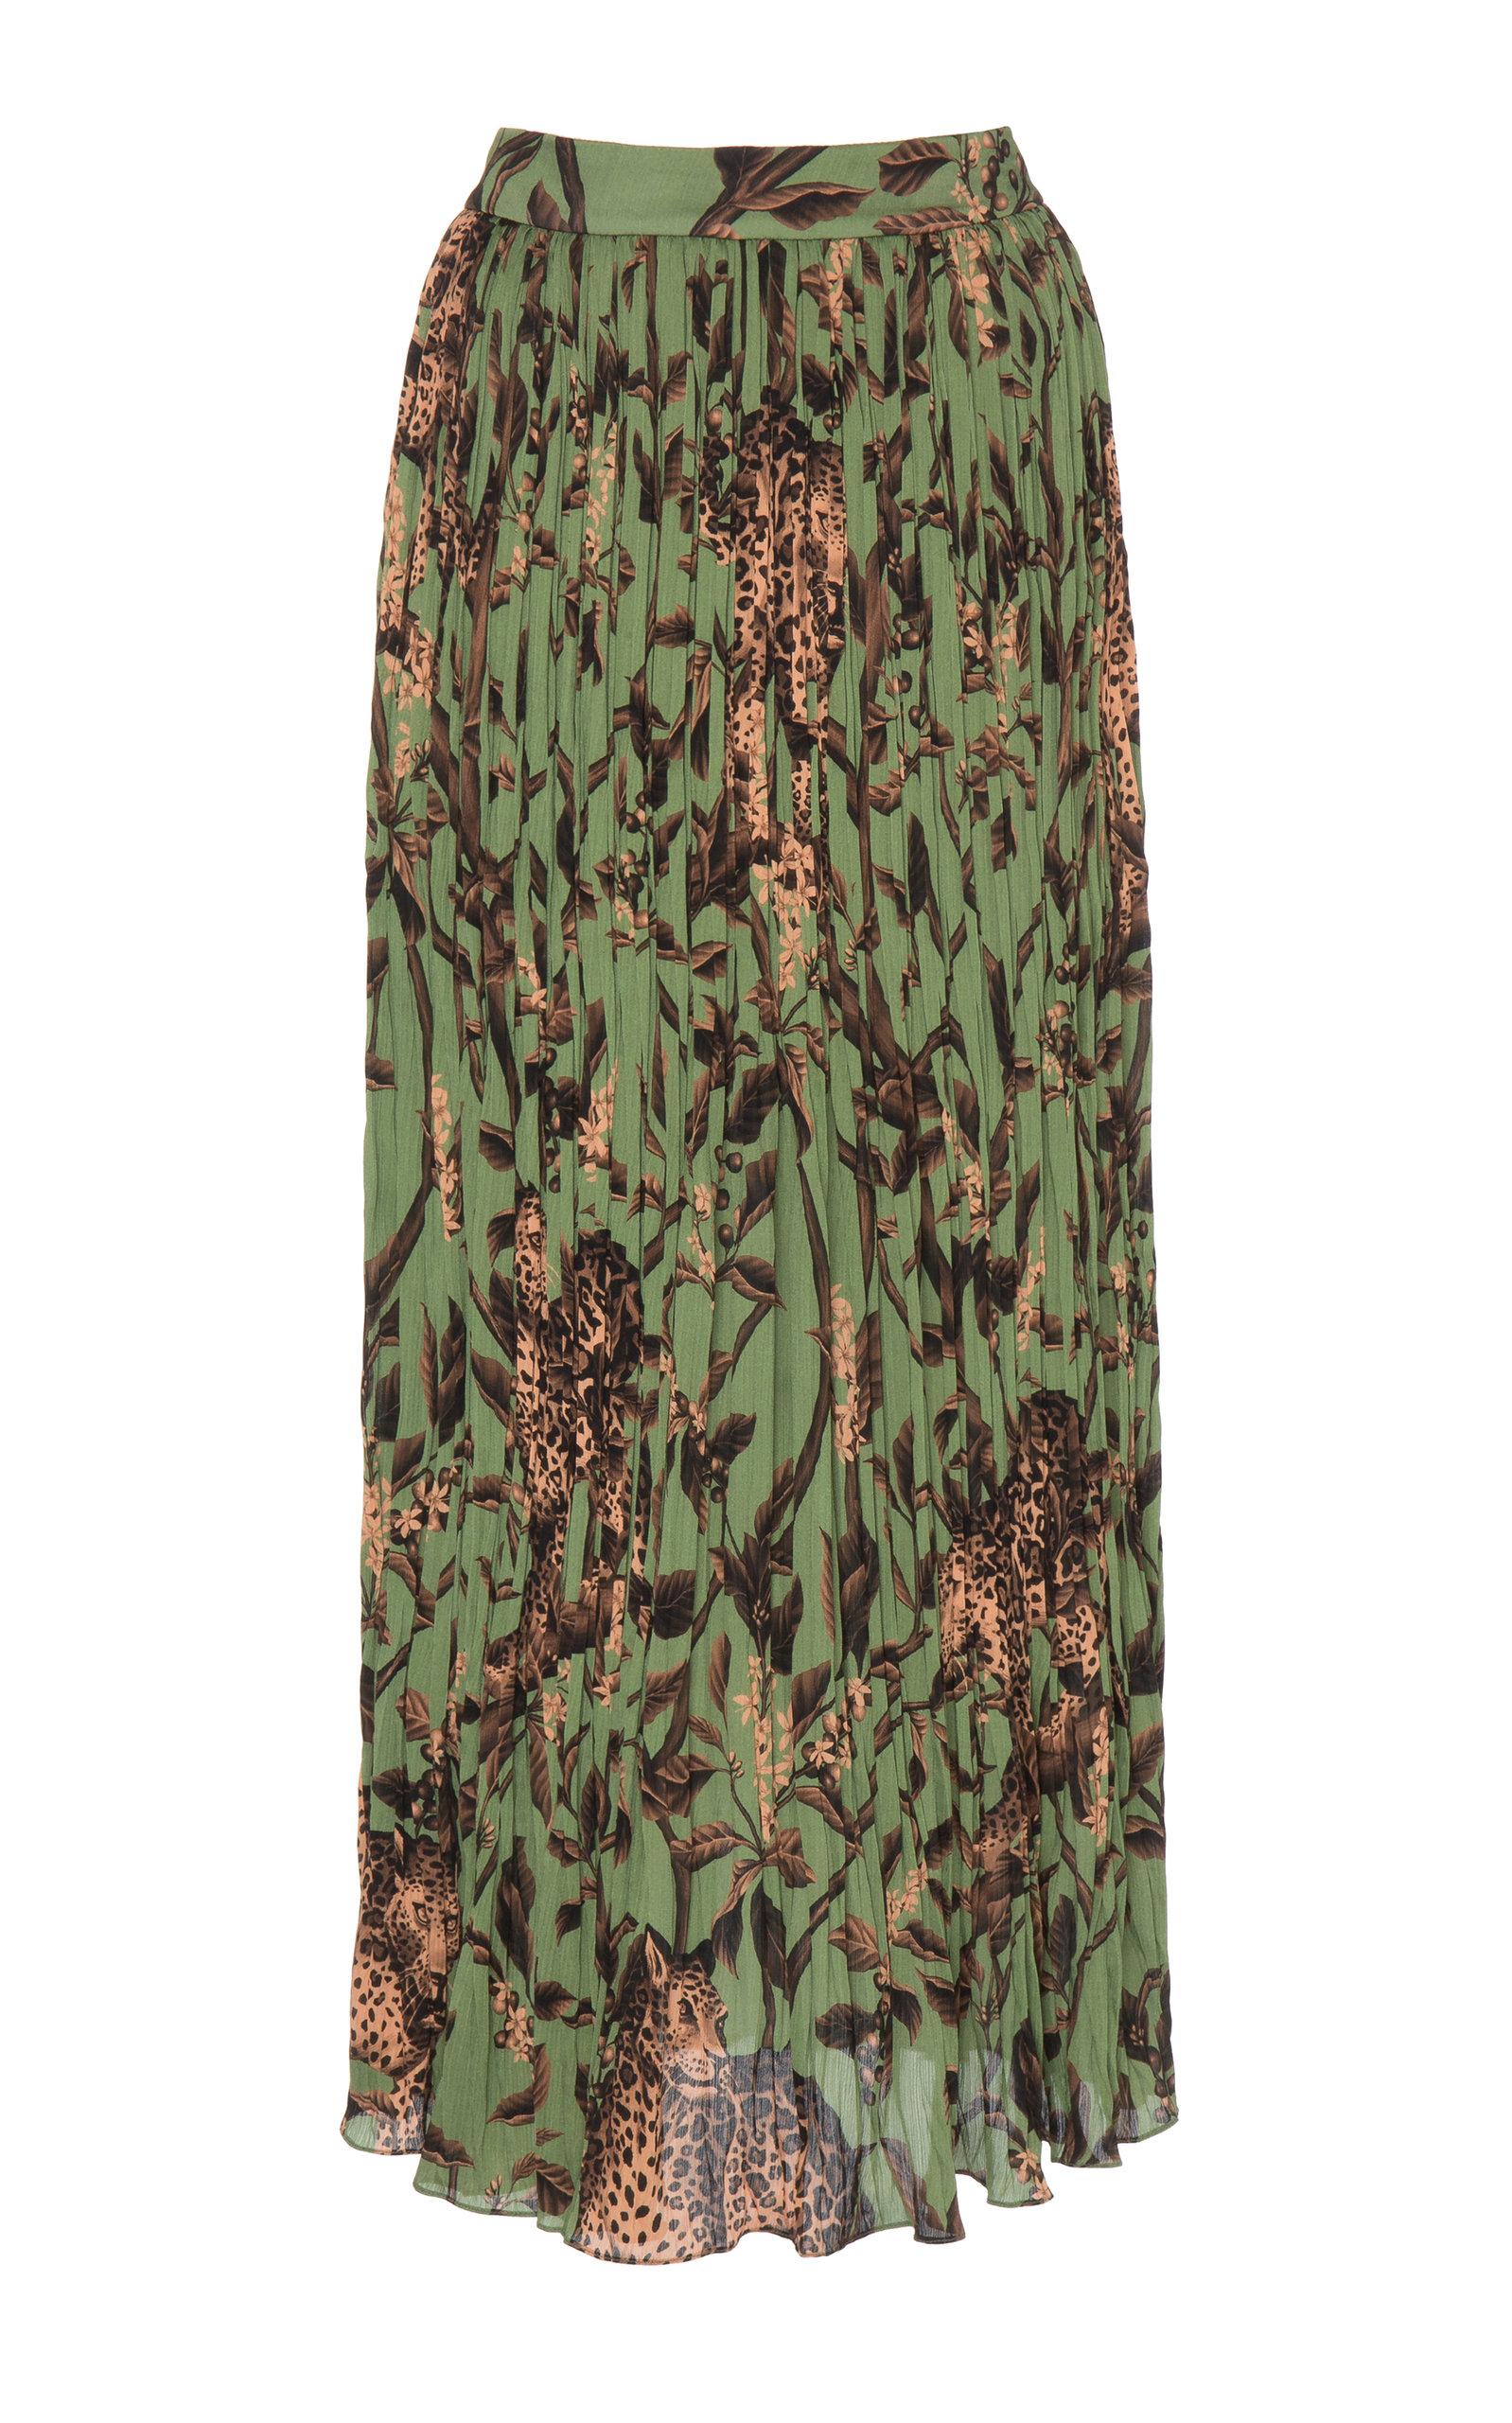 0d03b74446e American Bazi Women s Denim Short Mini Skirts RSS801 - LT.BLUE - 3X-Large